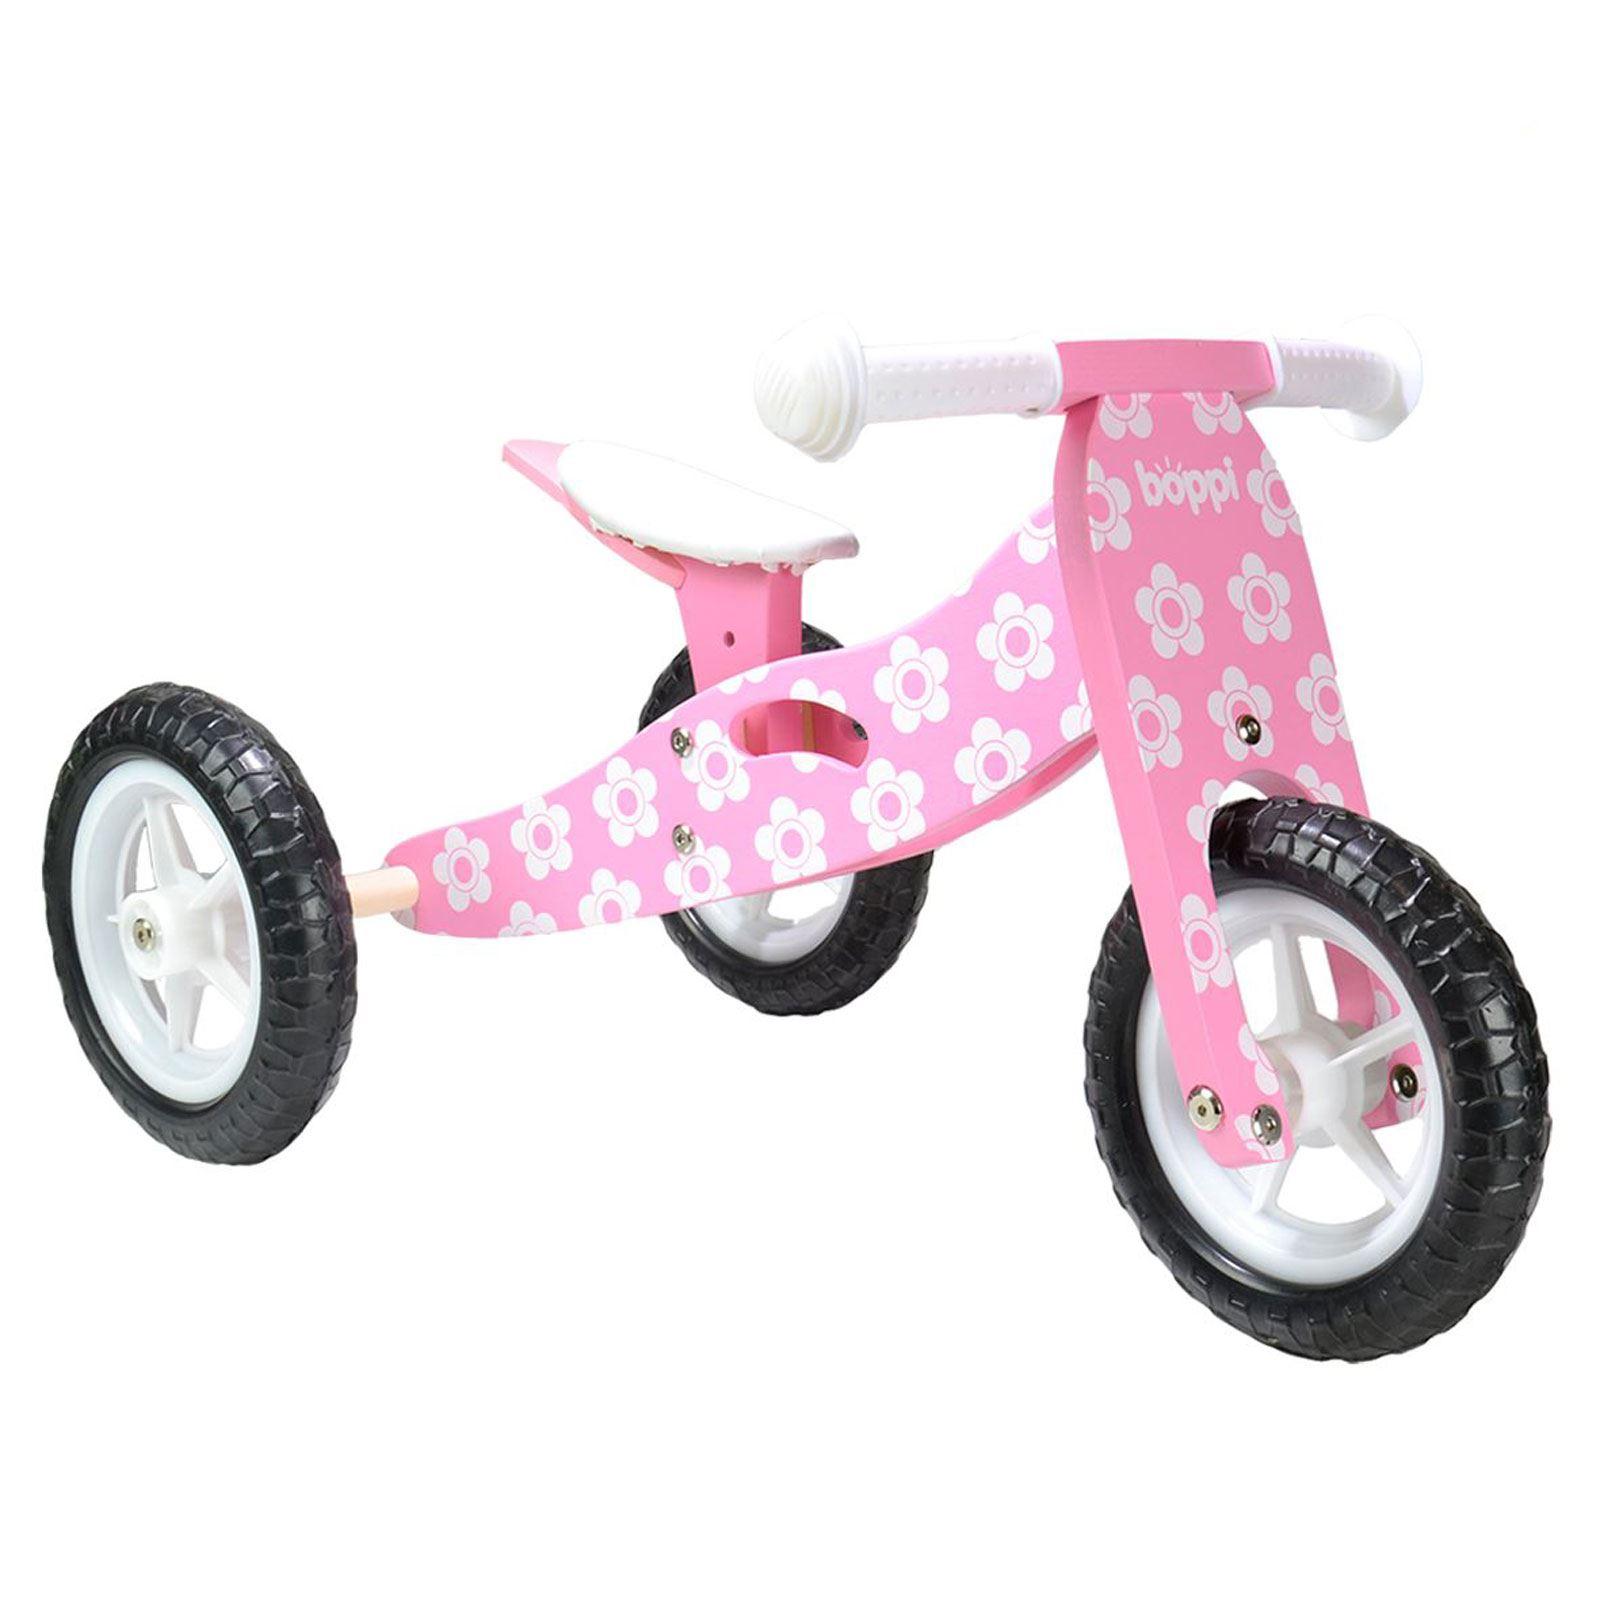 v lo tricycle bois d 39 quilibre entra nement petit enfant b b 2en1 ebay. Black Bedroom Furniture Sets. Home Design Ideas